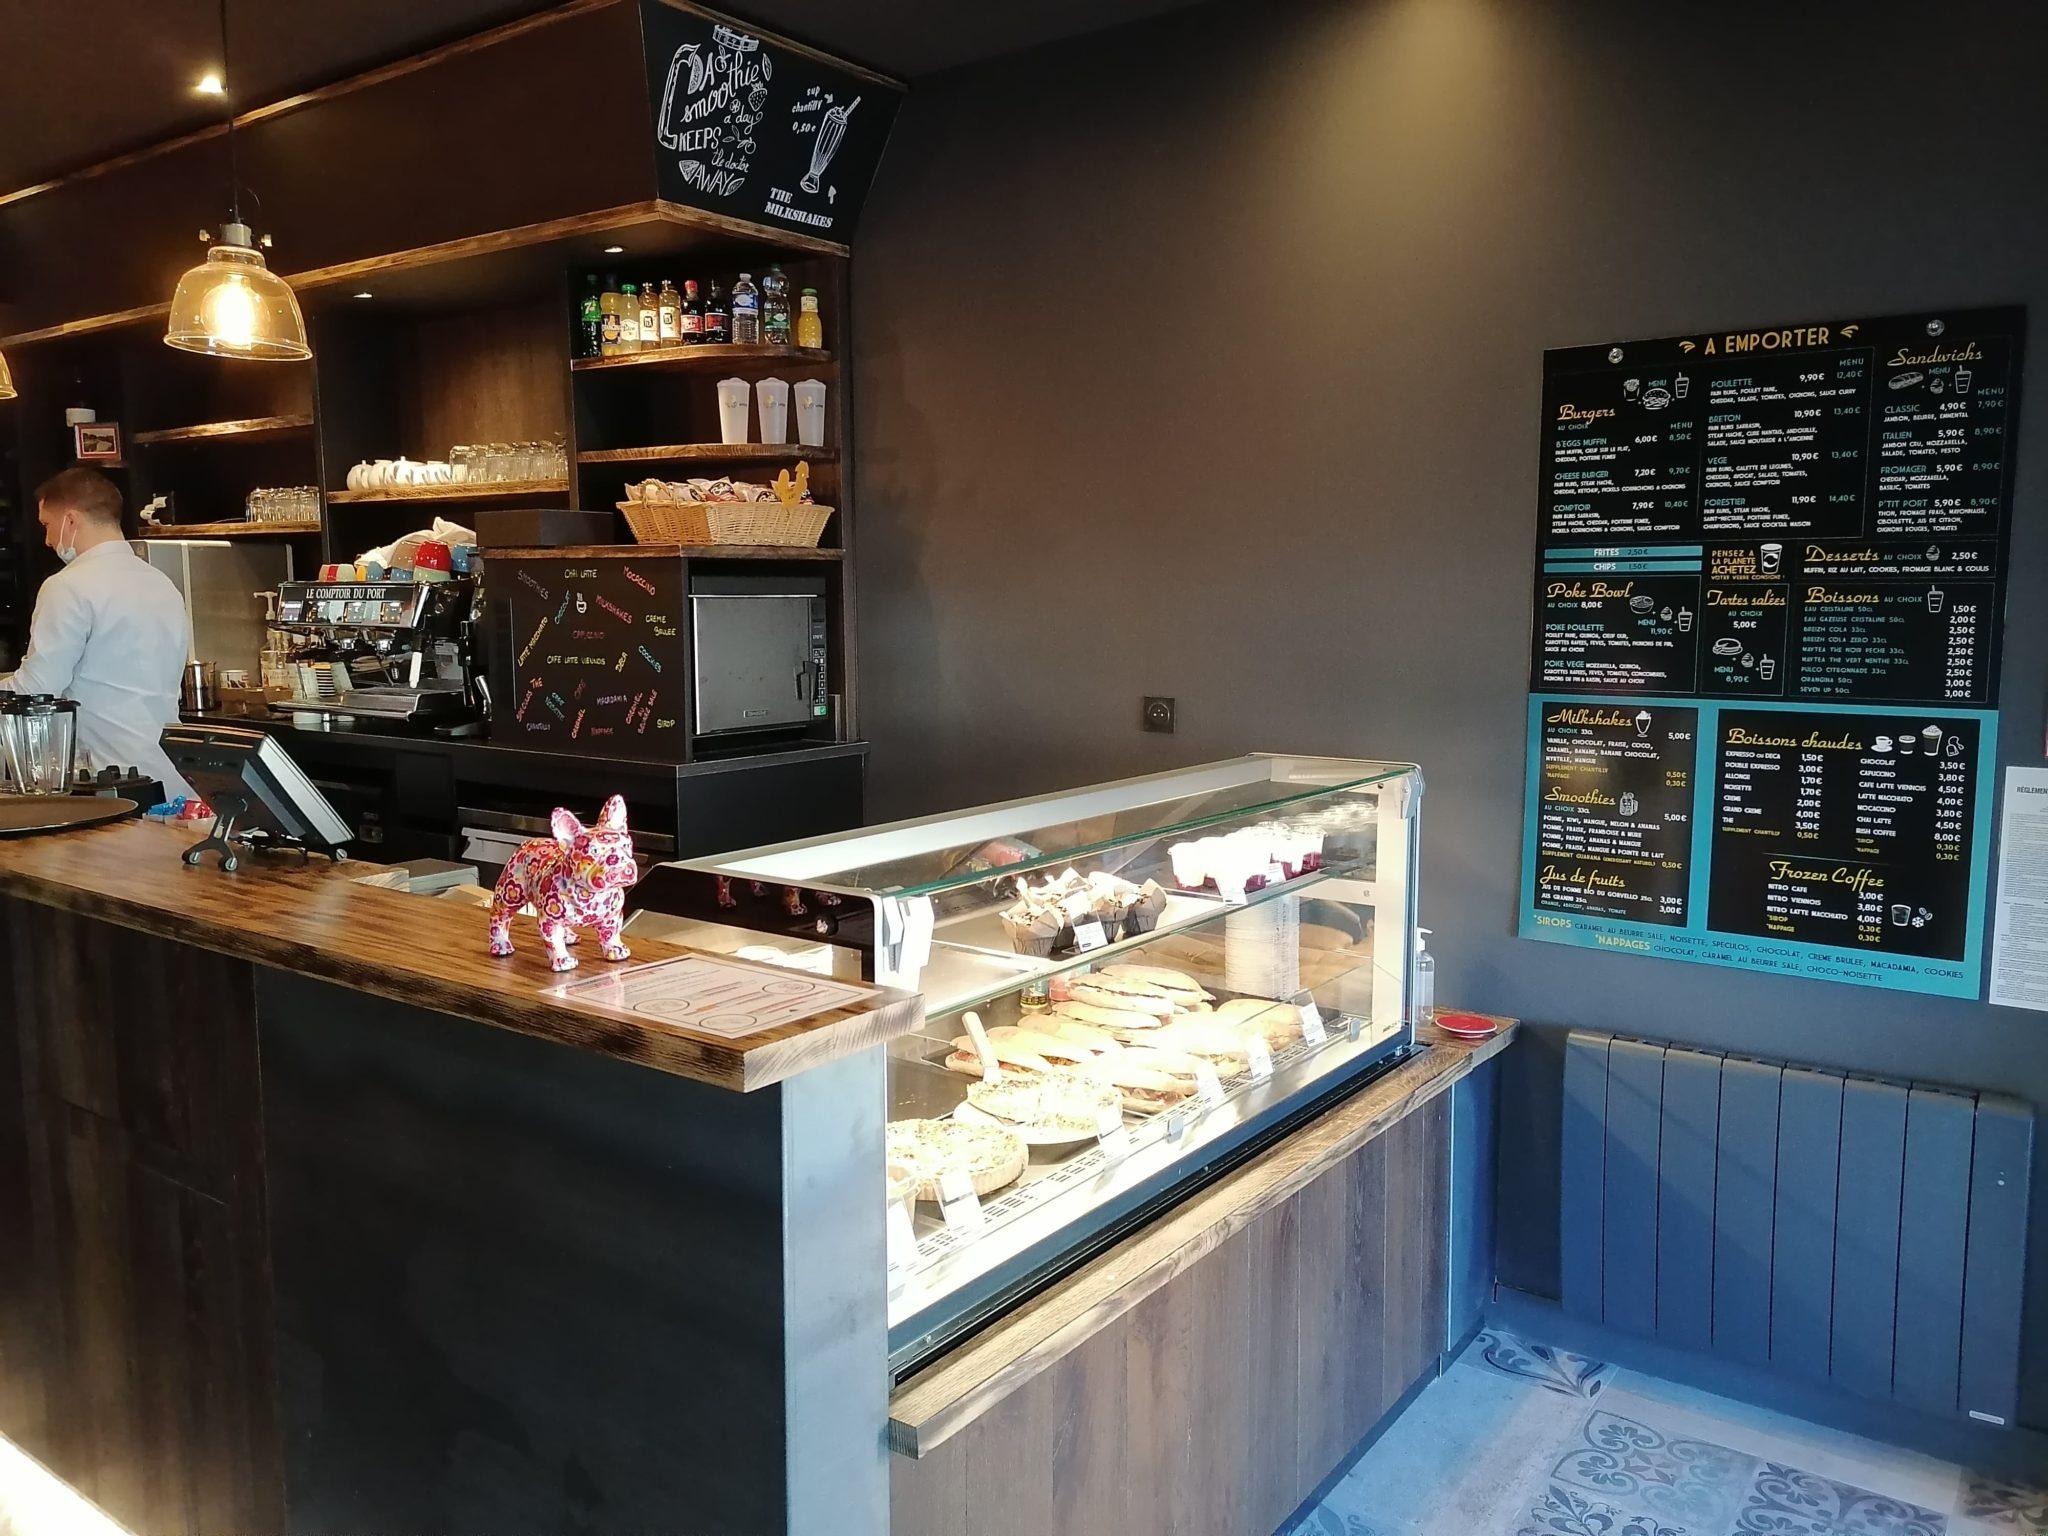 Café Bar Brasserie